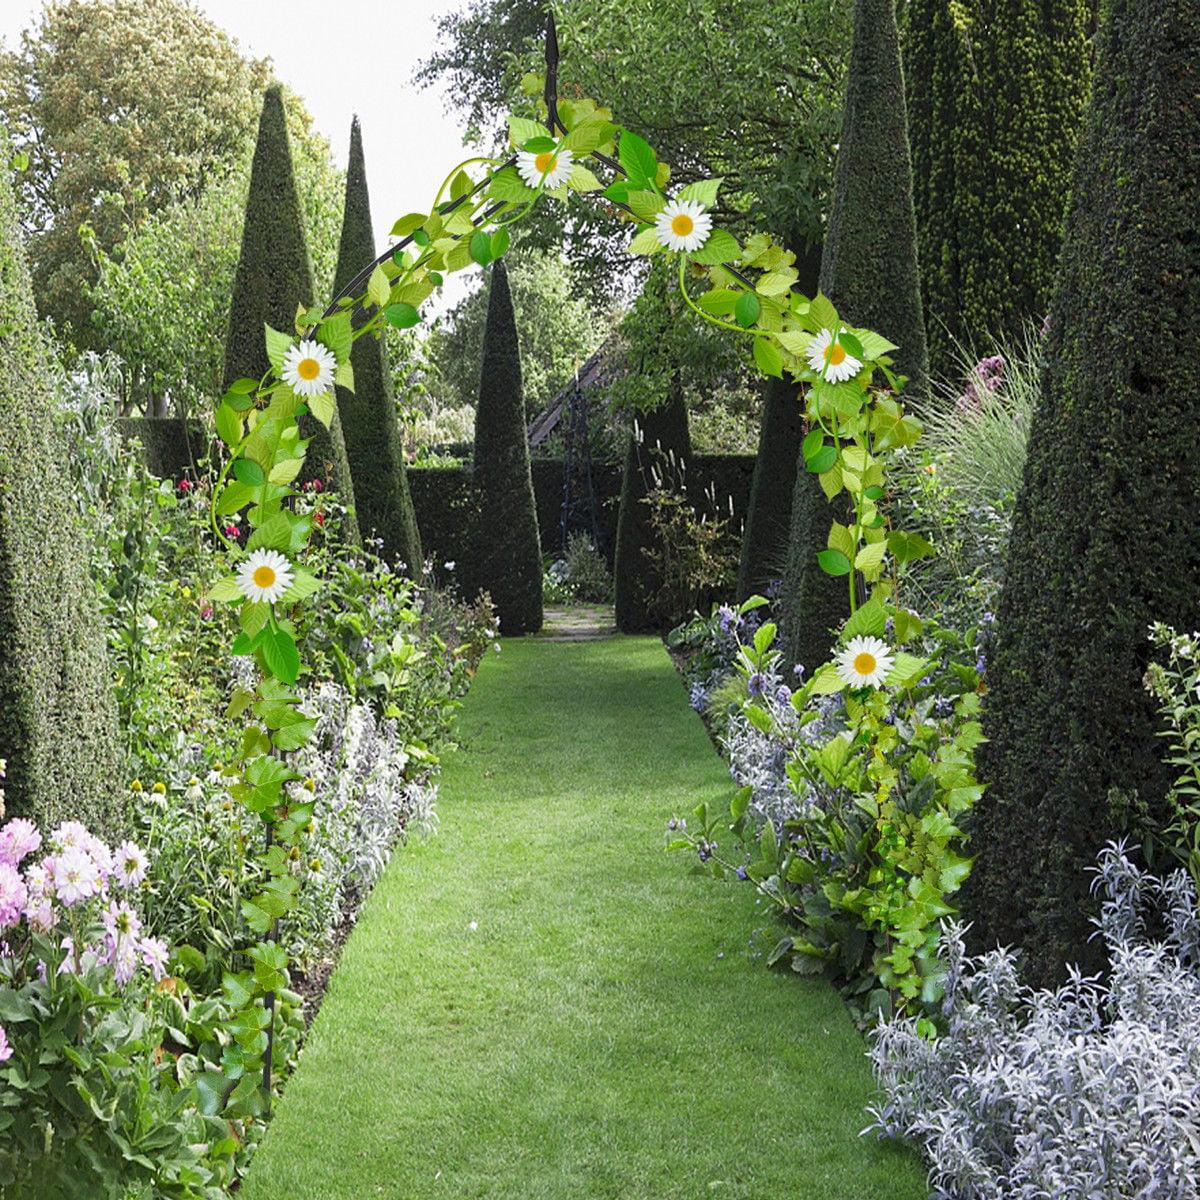 Costway 8'4'' High x 4'7'' Wide Steel Garden Arch Rose Arbor Climbing Plant Outdoor Garden by Arbors